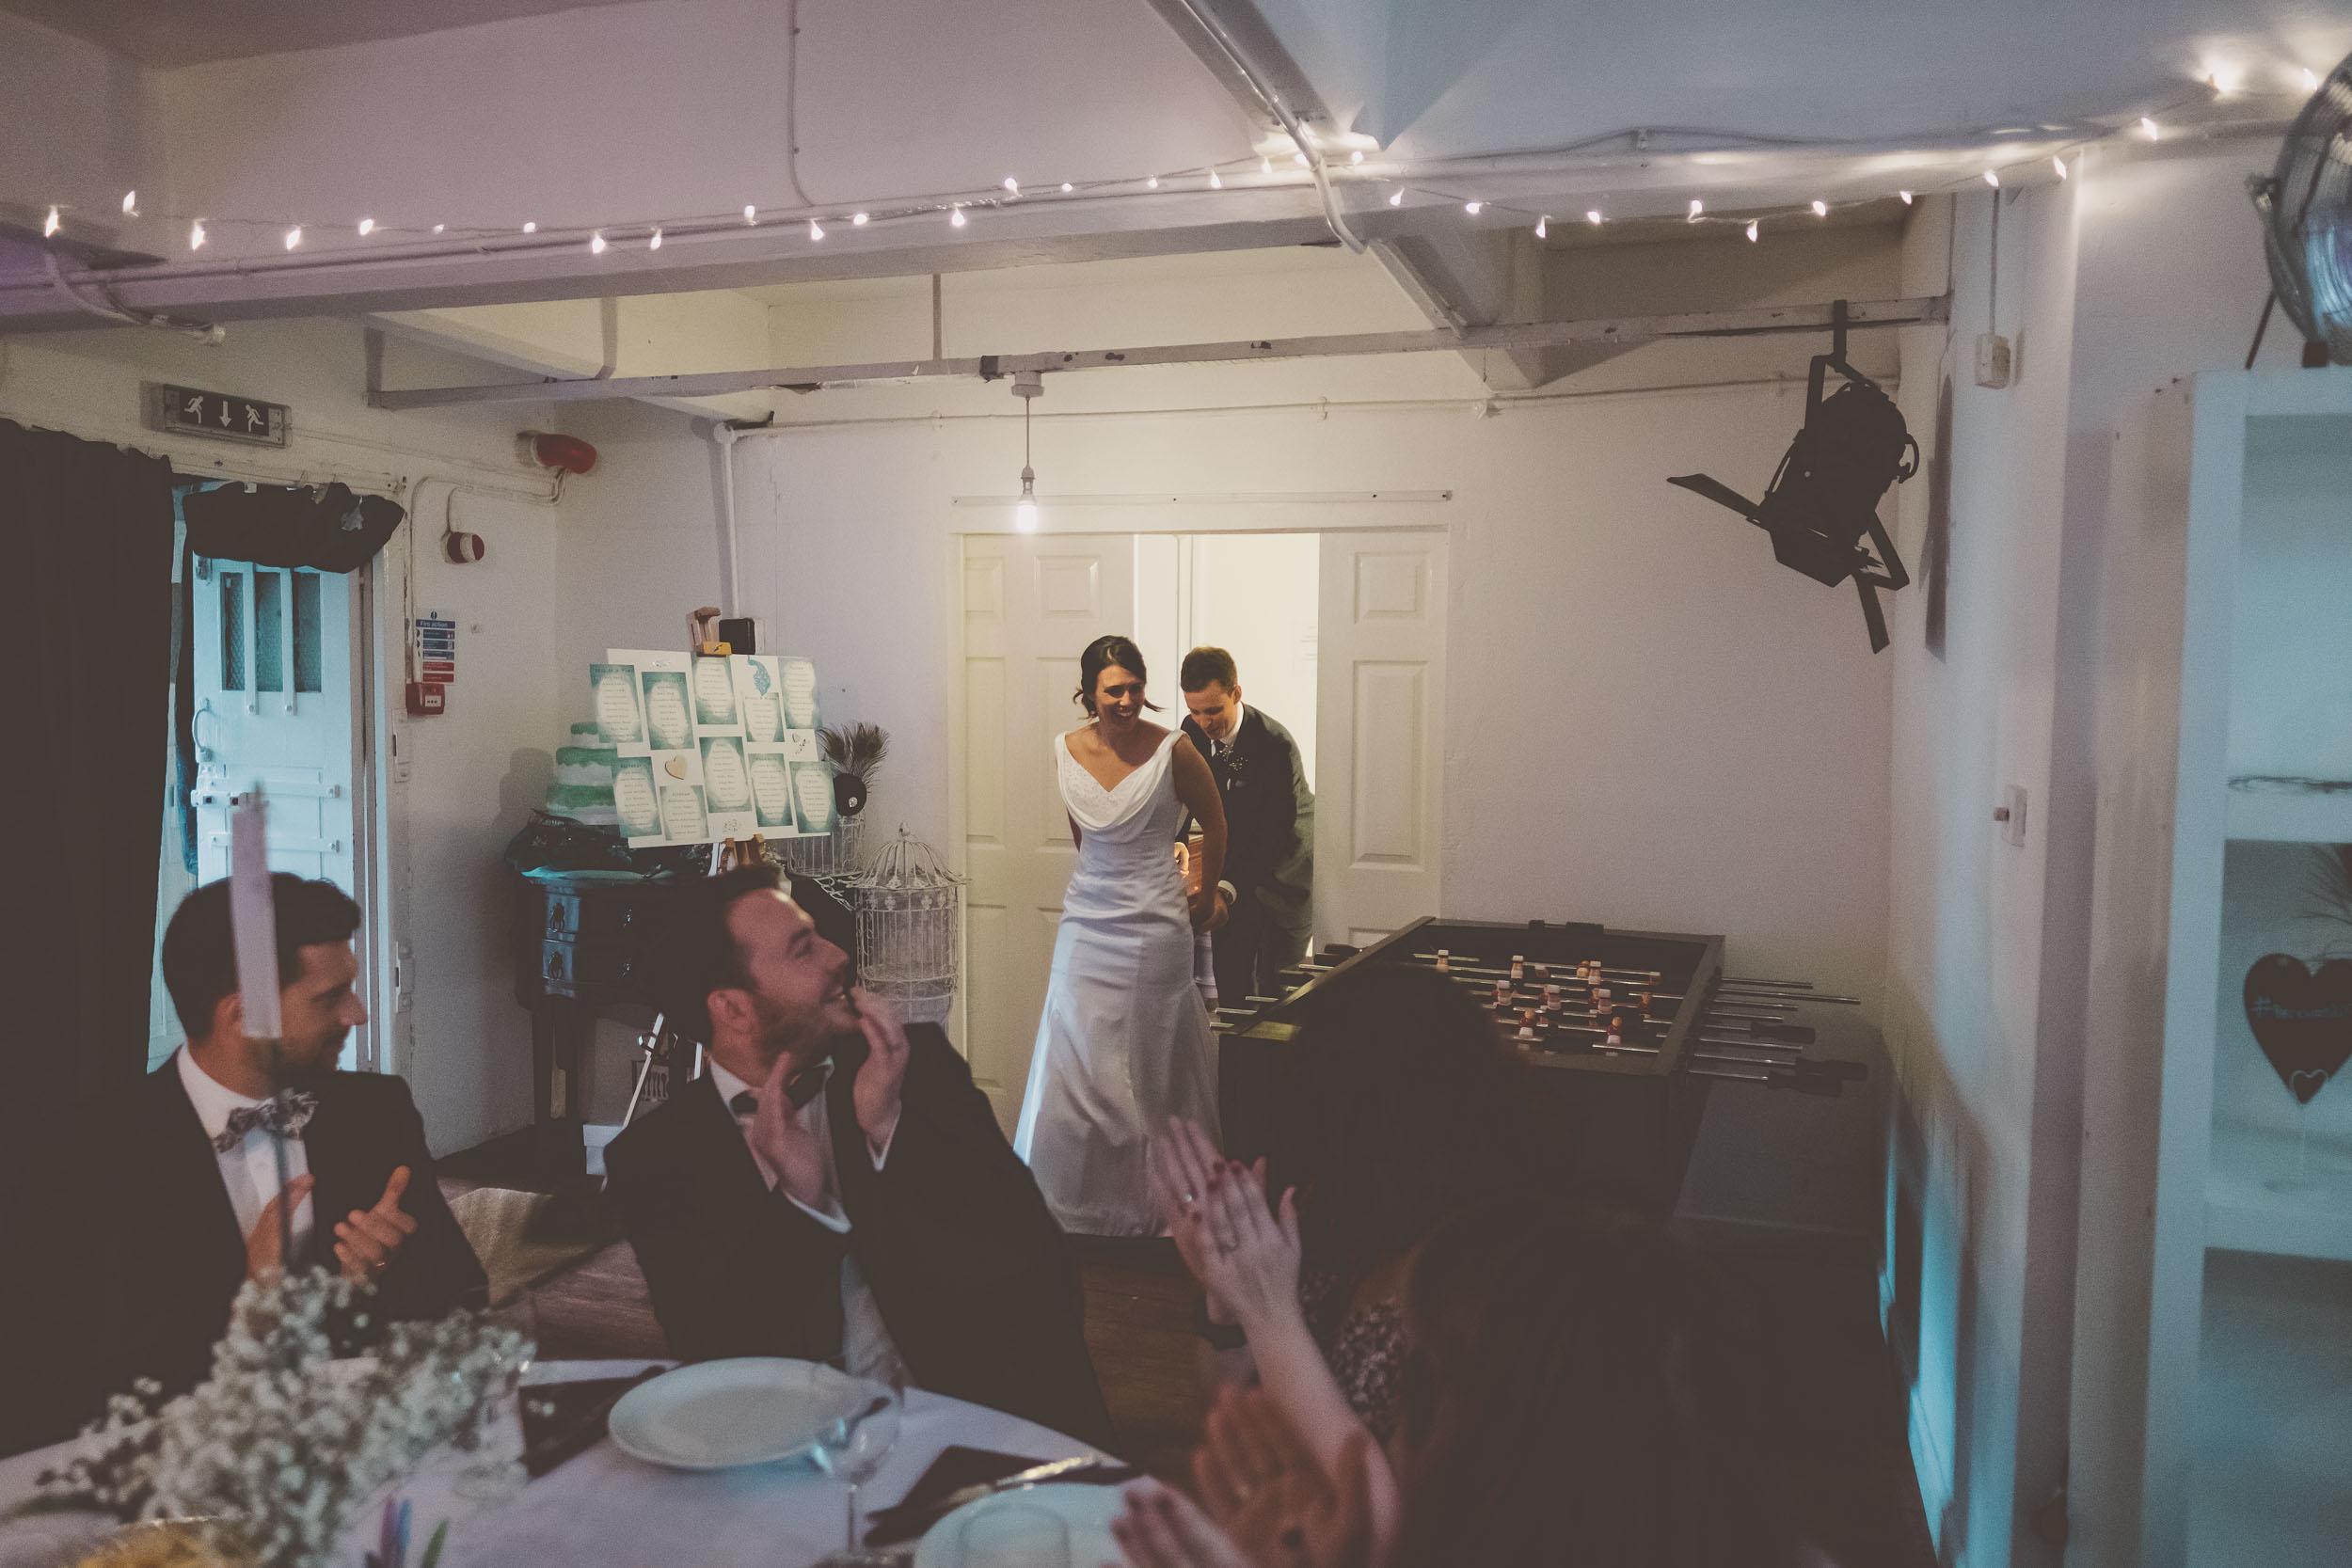 islington-town-hall-4th-floor-studios-wedding341.jpg